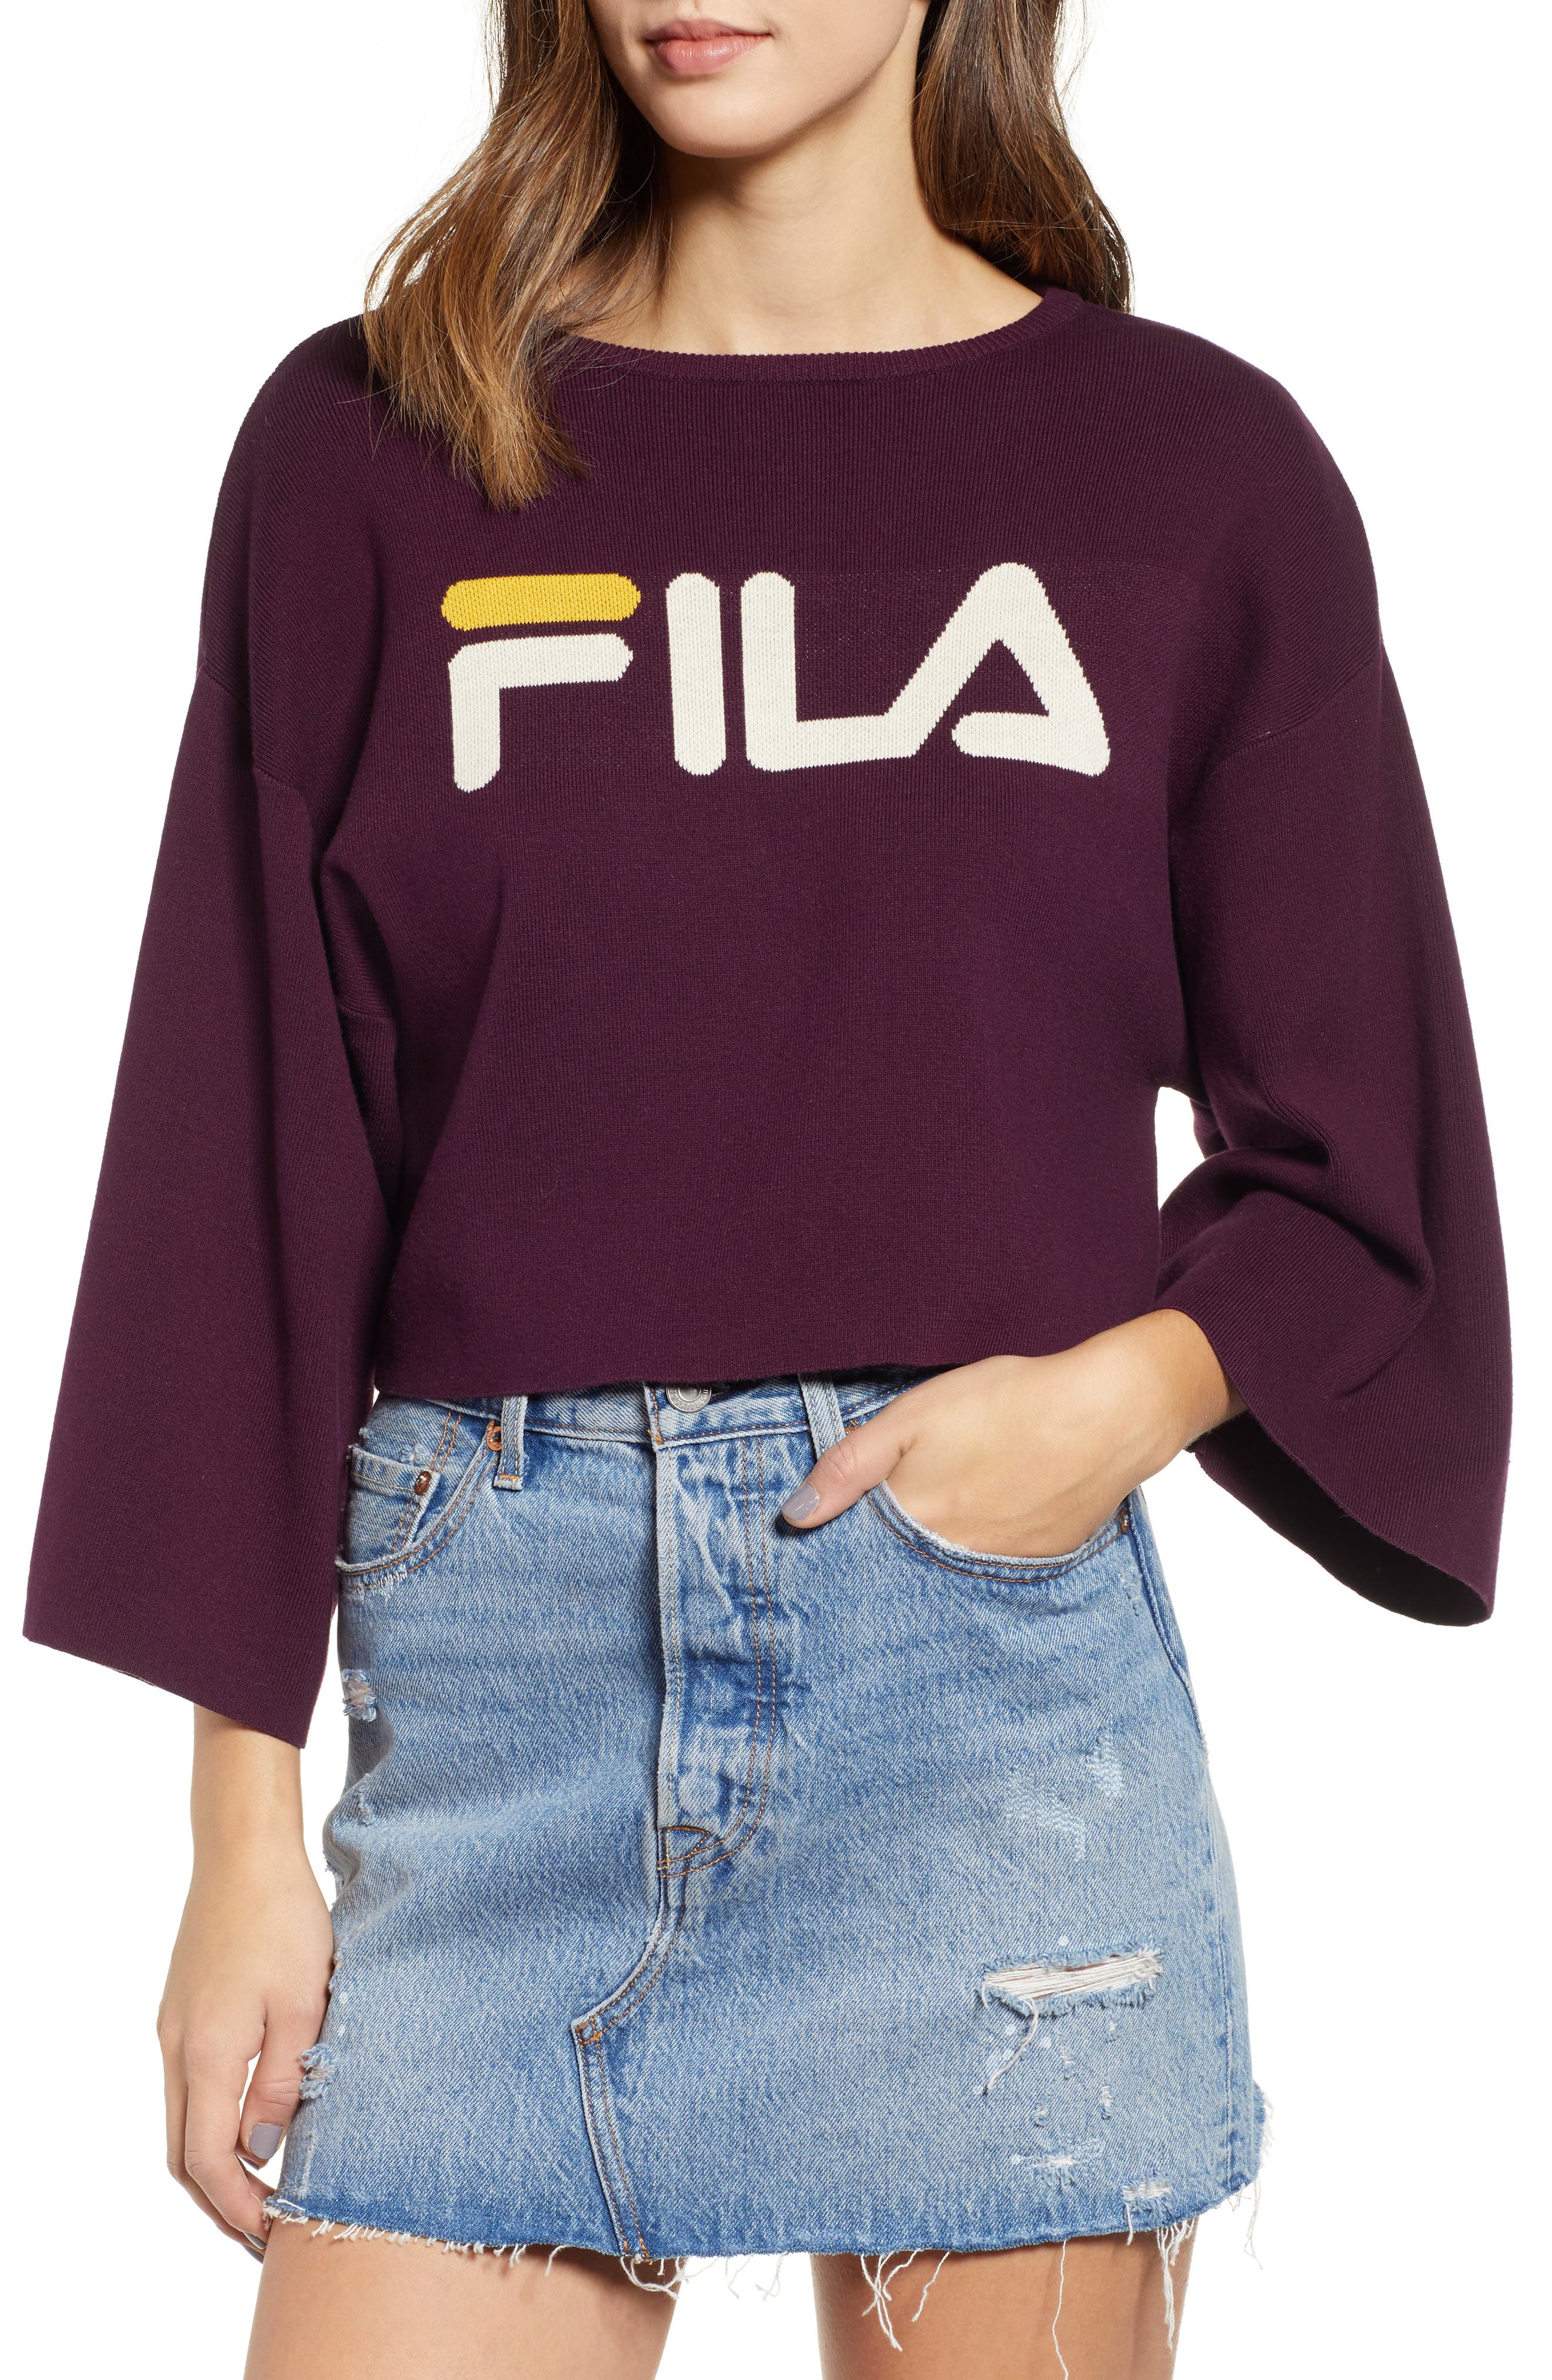 FILA, Palmira Crop Sweater, Main thumbnail 1, color, POTENT PURPLE